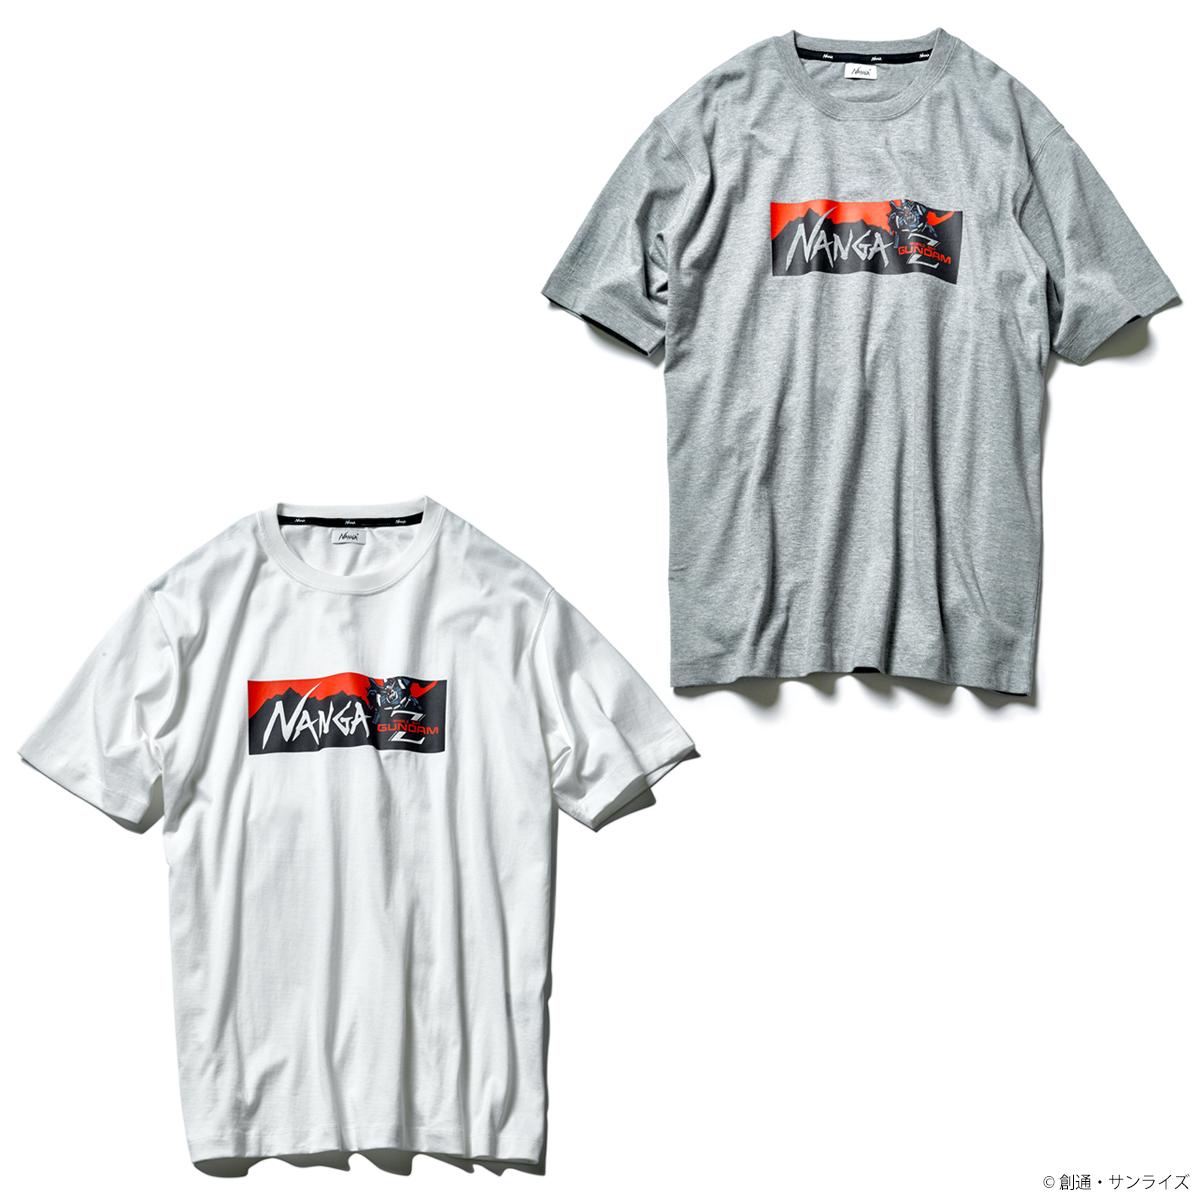 STRICT-G × NANGA 『機動戦士Zガンダム』35周年記念 ロゴデザインTシャツ